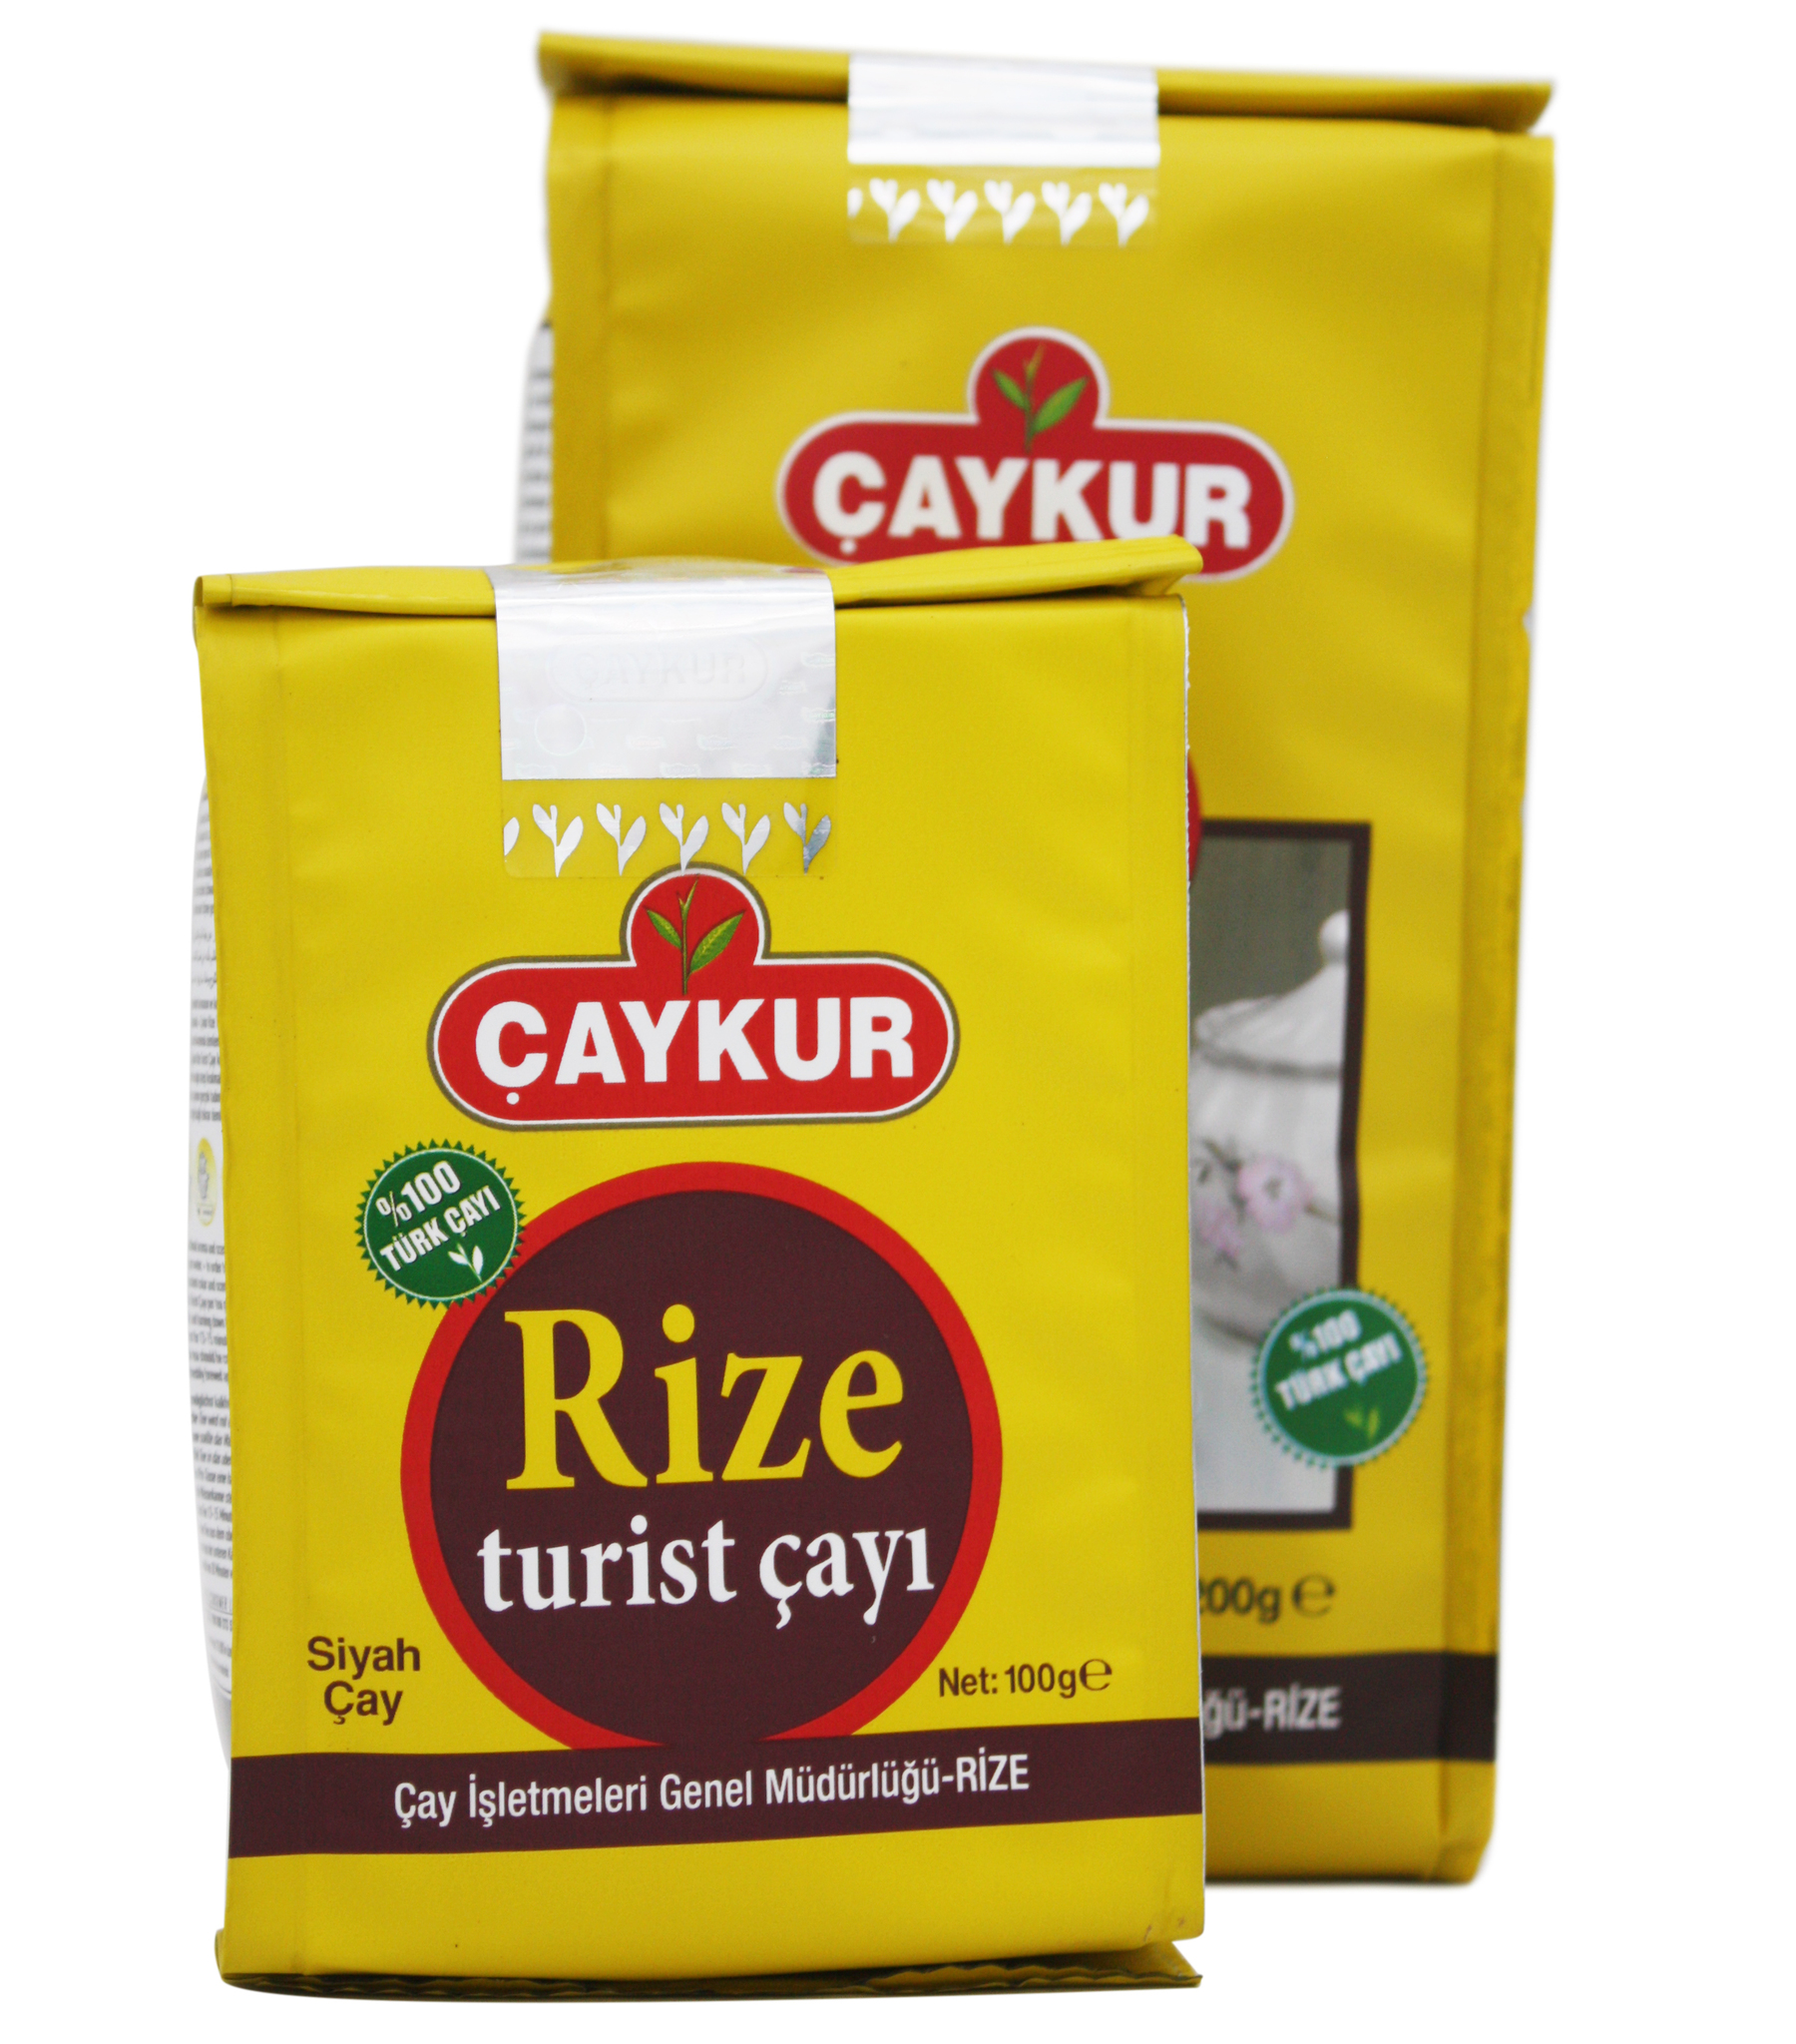 Чай Турецкий черный чай Rize Turist, Çaykur, 100 г import_files_d9_d9ec985634d611e9a9a6484d7ecee297_06646423ef3211e9a9ba484d7ecee297.jpg